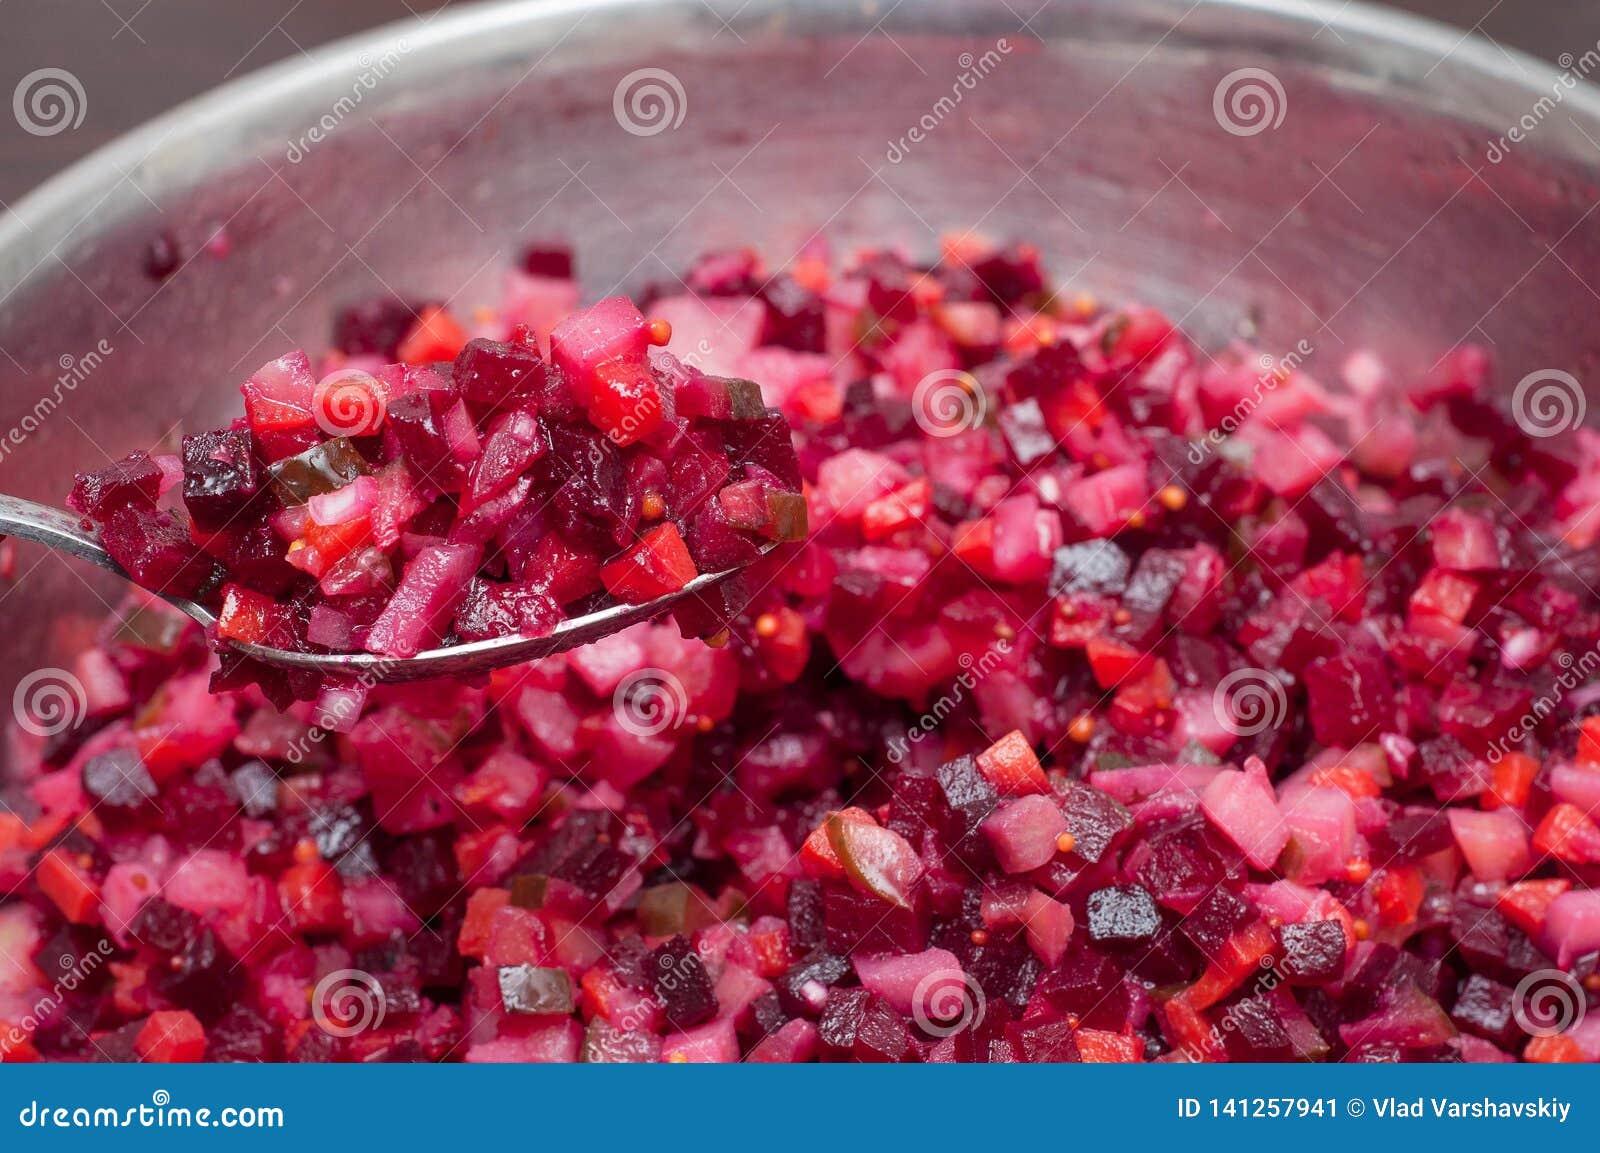 Gemüsesalat mit verschiedenen Bestandteilen